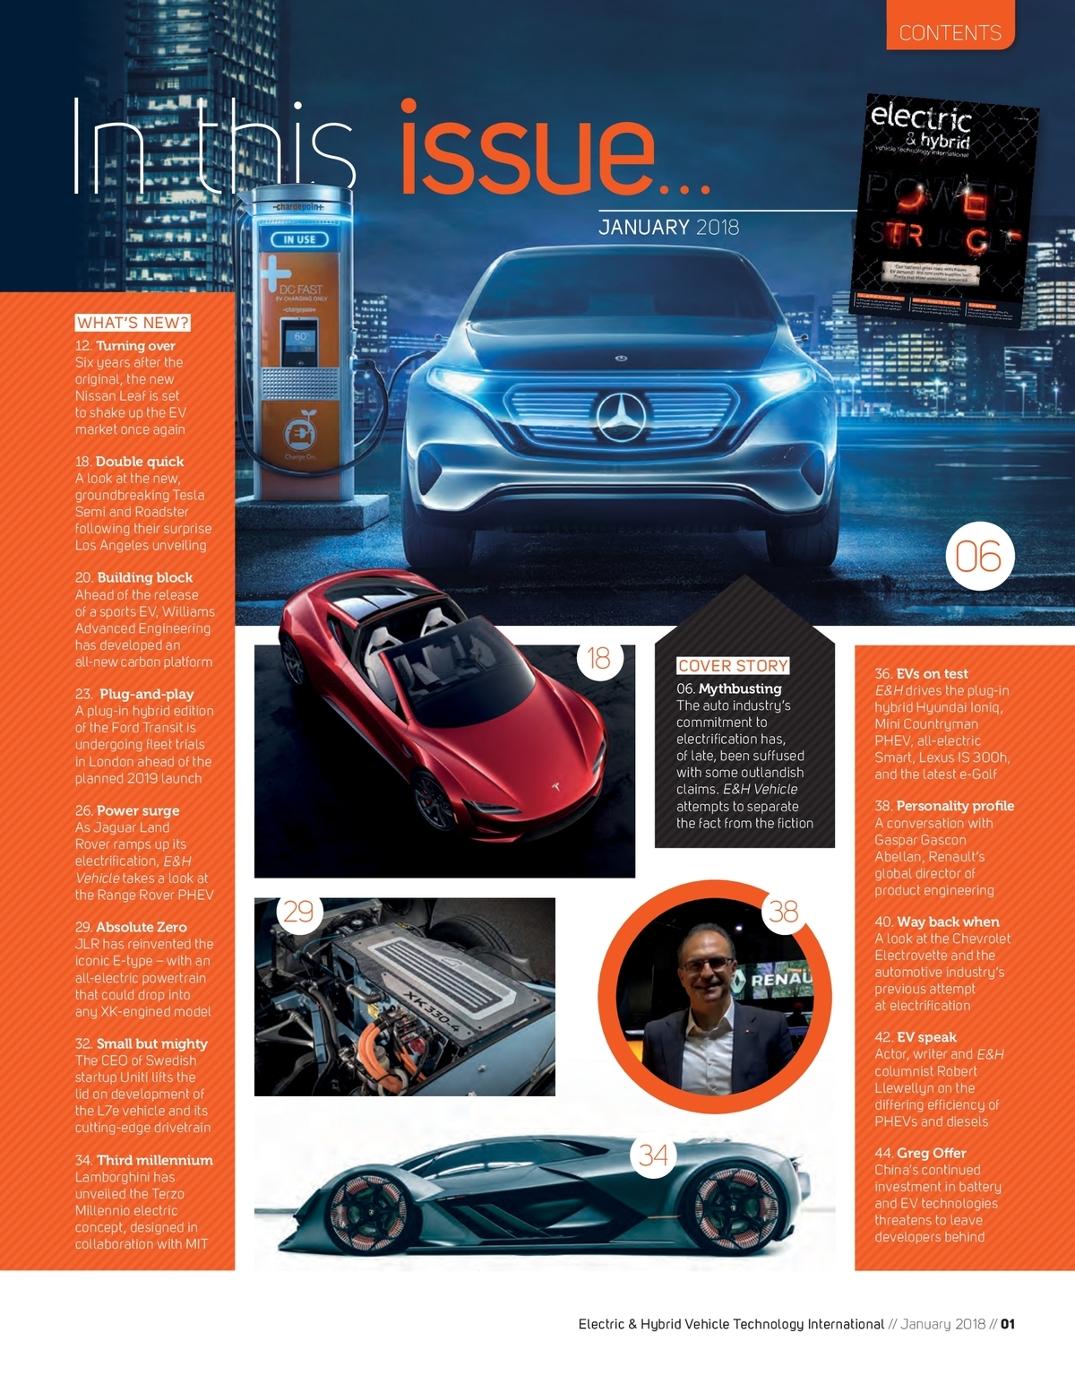 Electric & Hybrid Vehicle Technology International - January